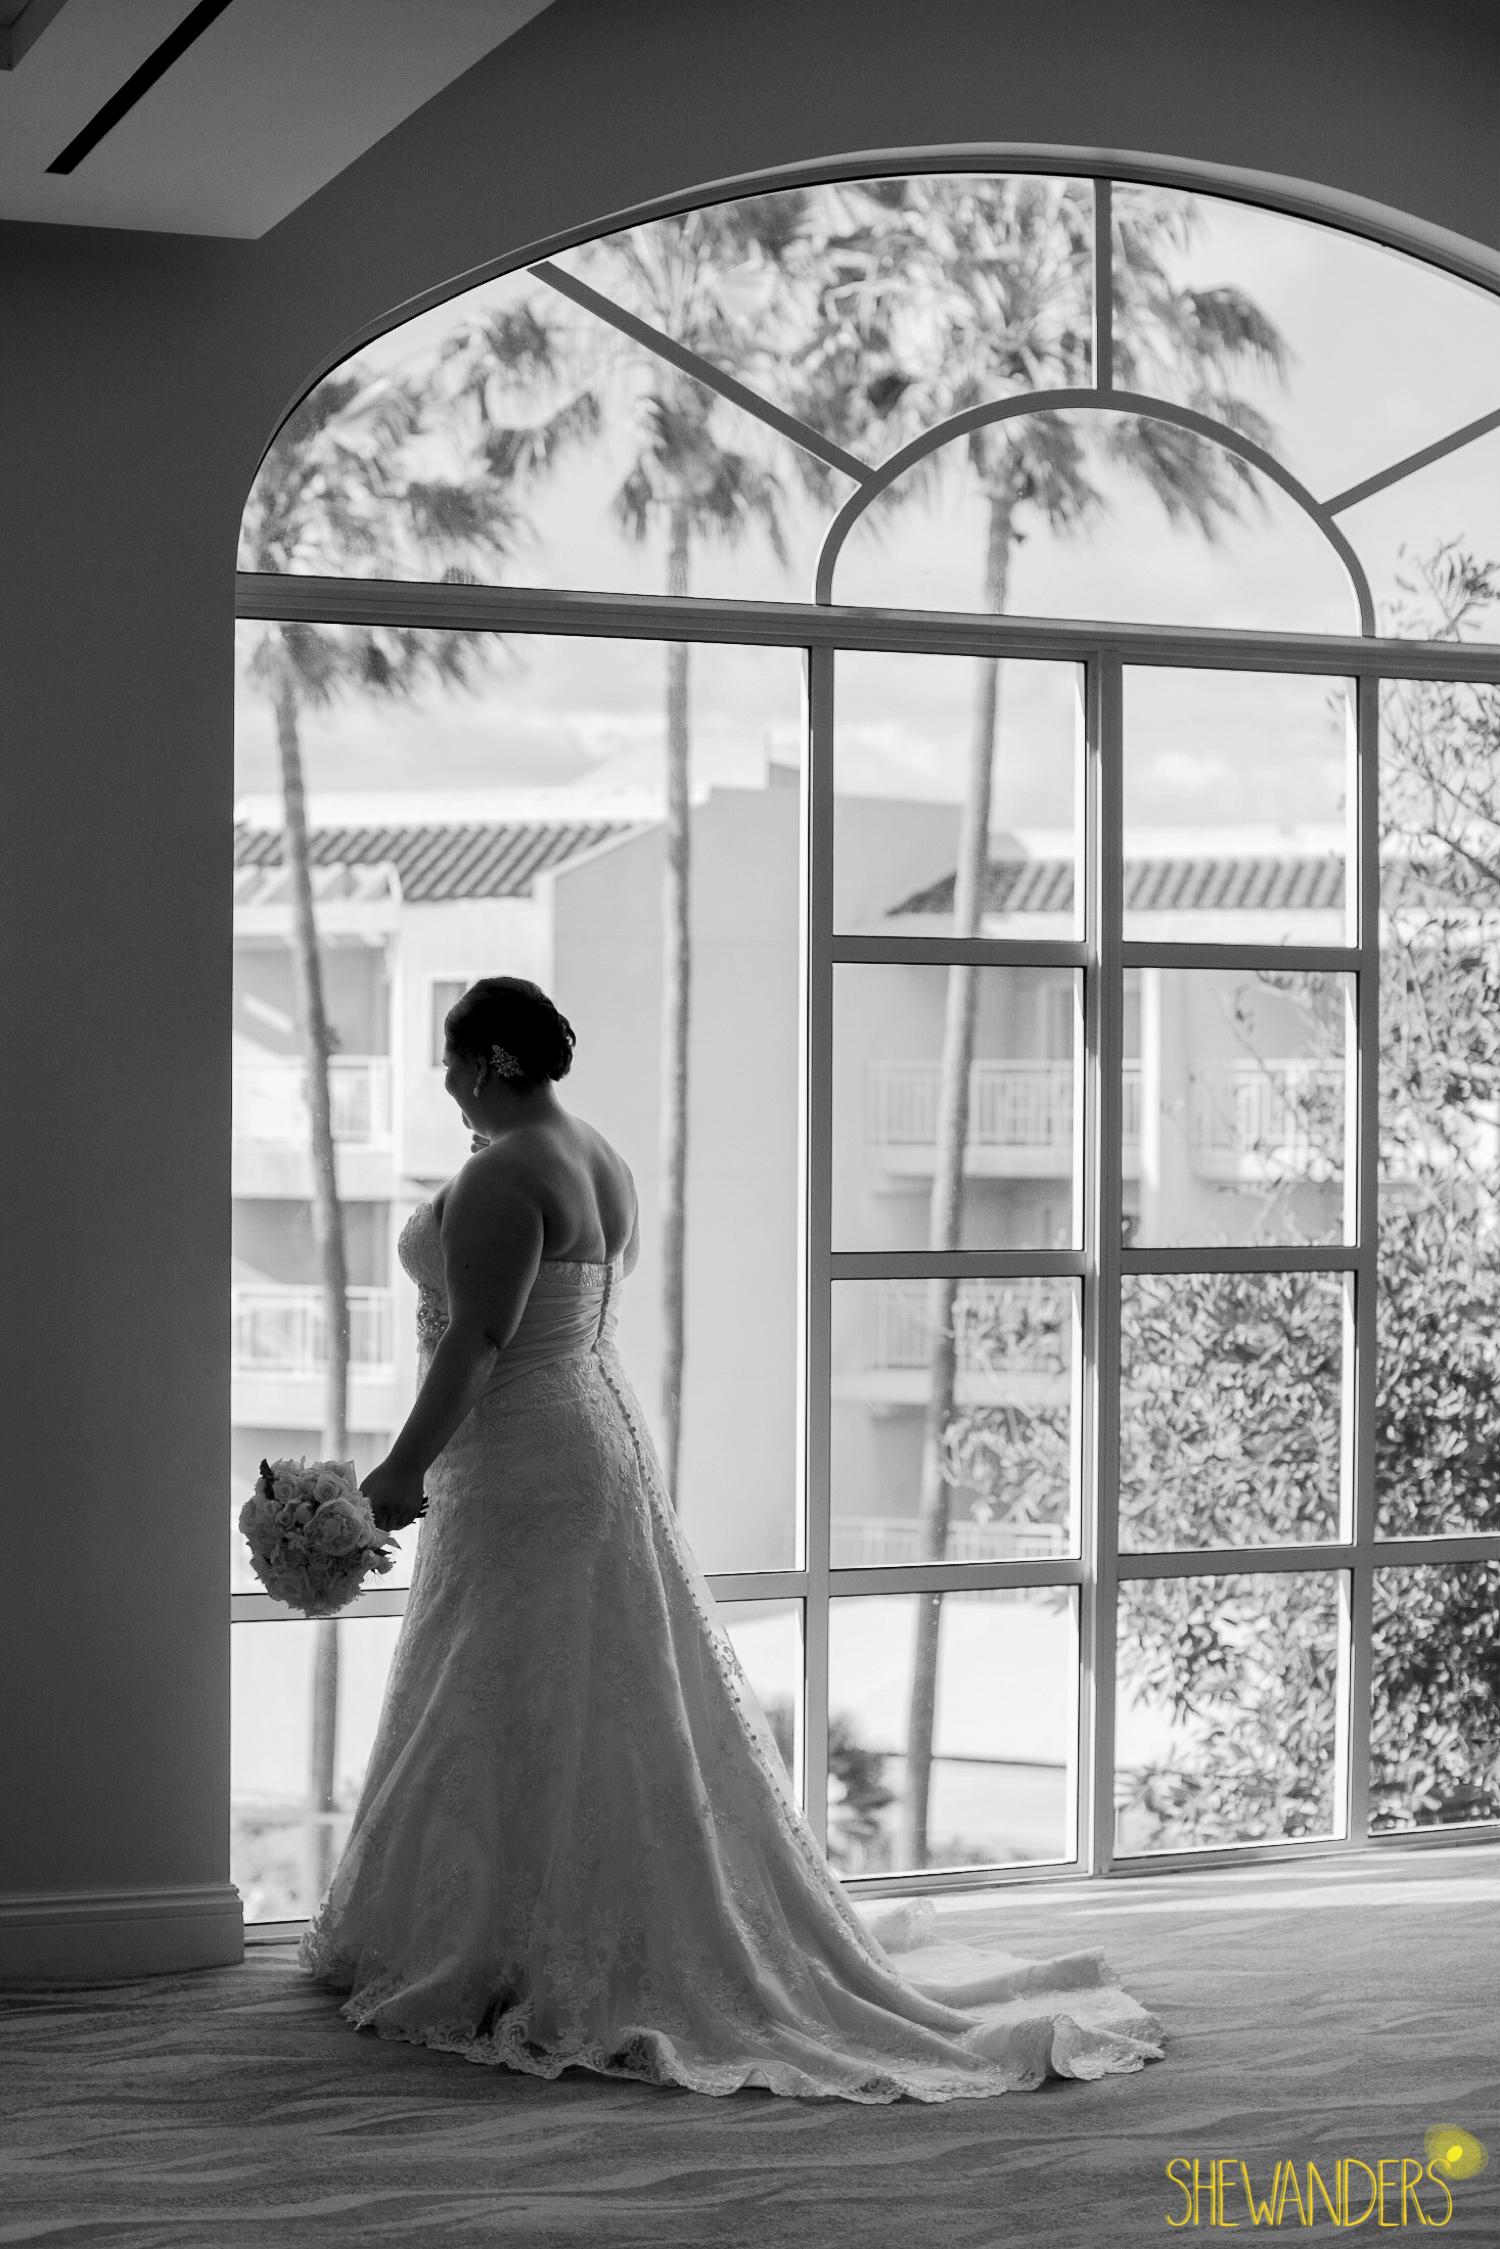 Shewanders.Coronado.Wedding.LaurenJessica-1031.jpg.Wedding.LaurenJessica-1031.jpg